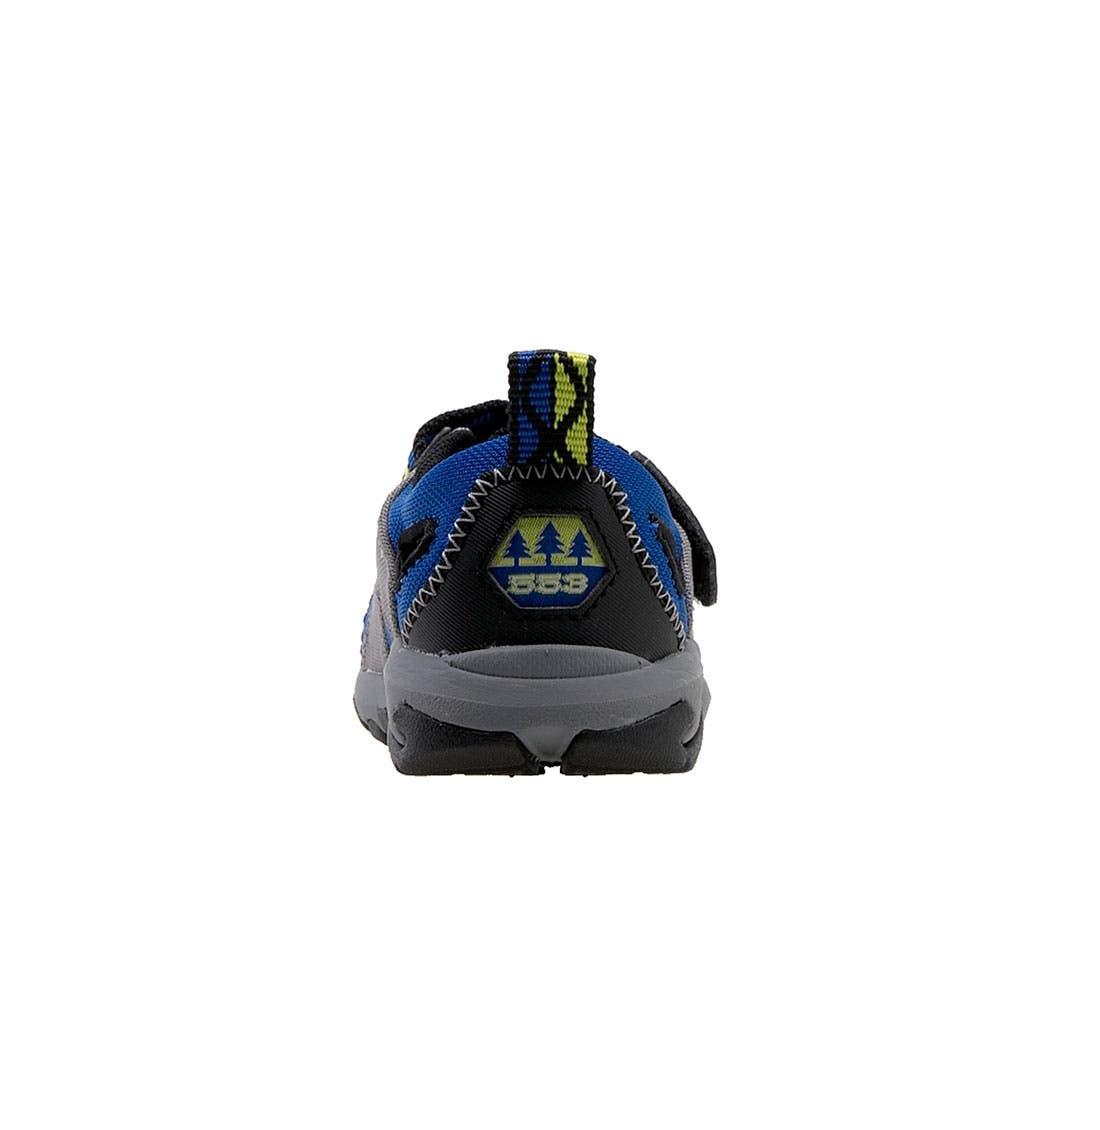 '553' Water Sandal,                             Alternate thumbnail 4, color,                             400